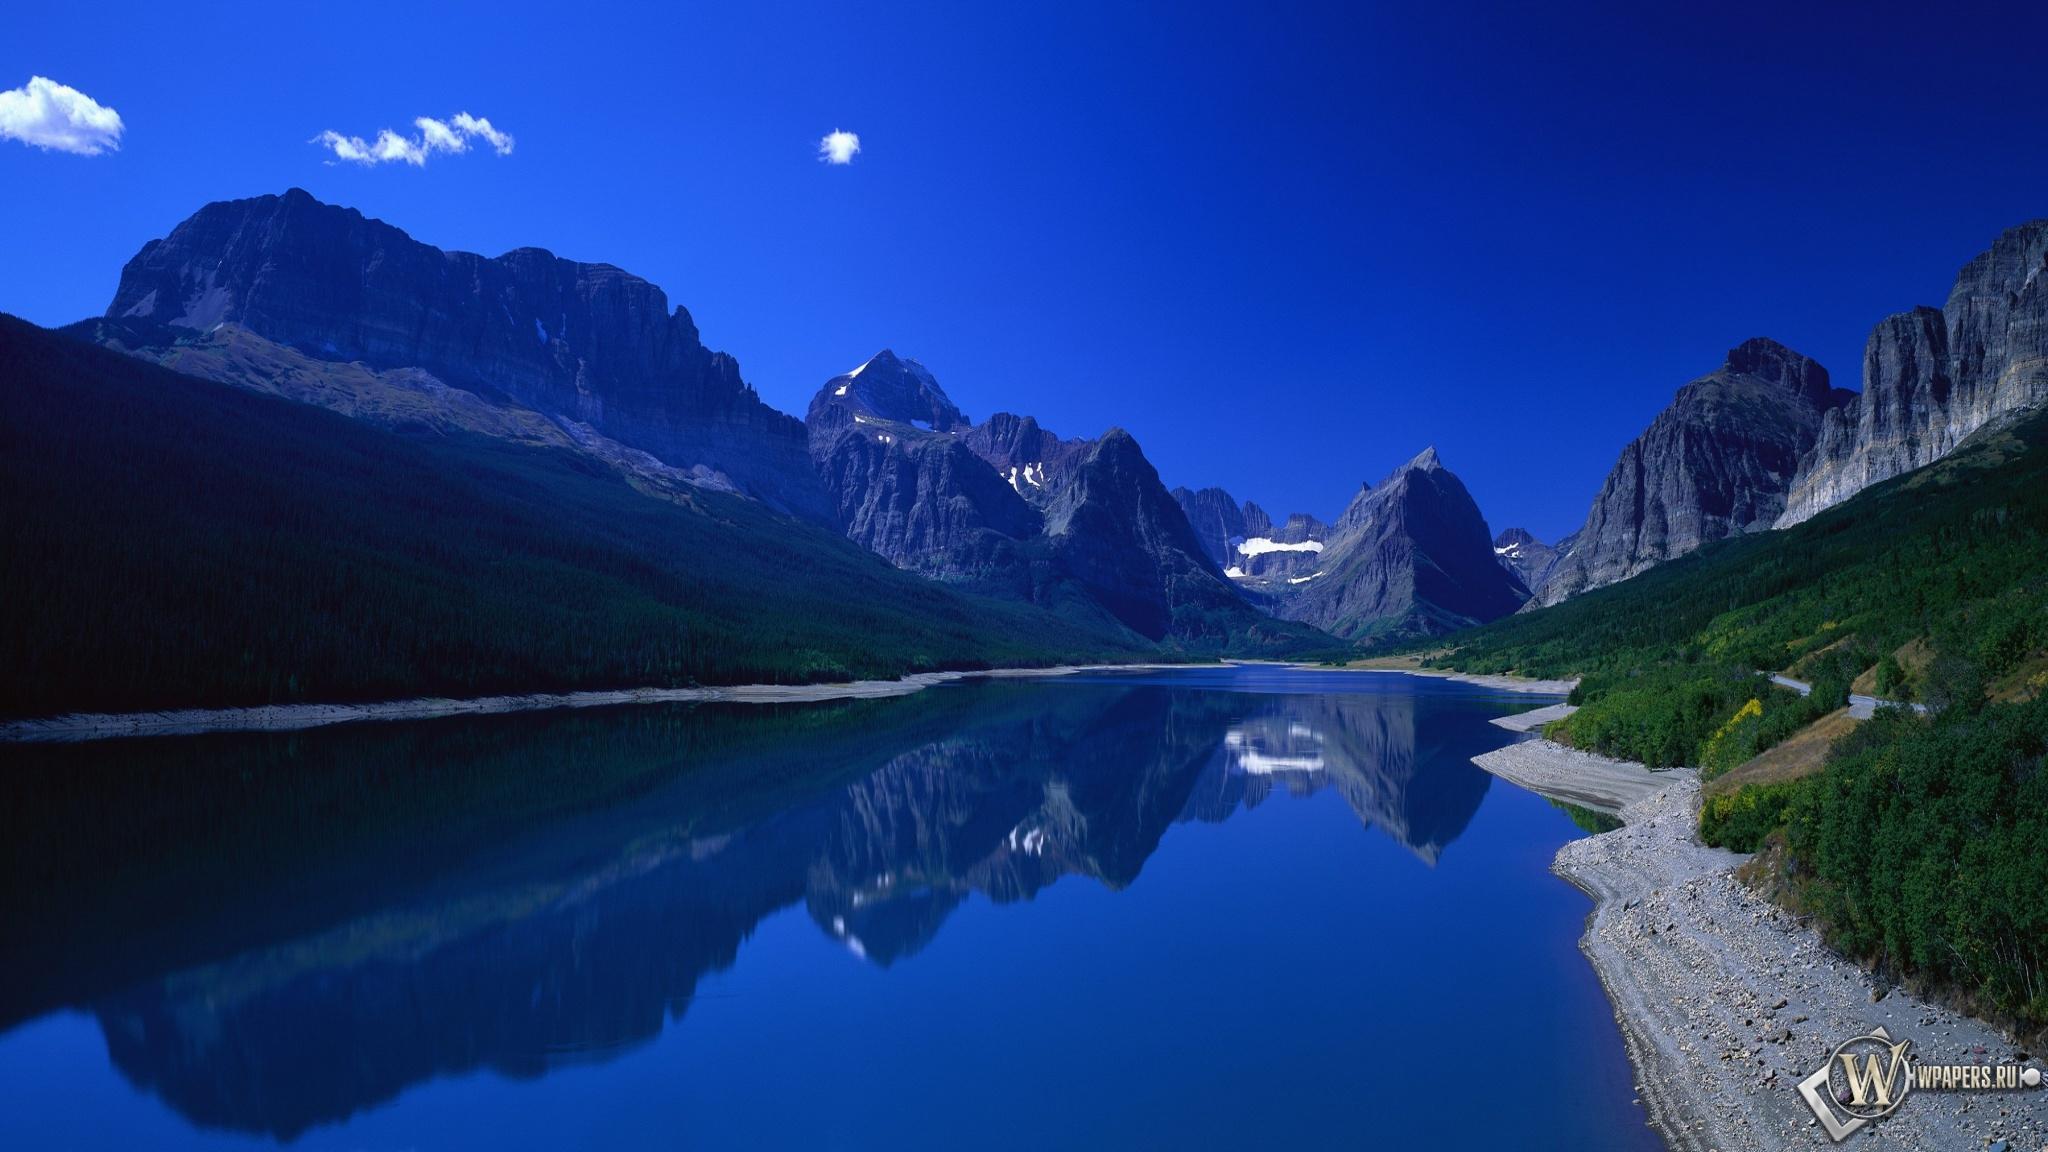 Фантастическое озеро 2048x1152